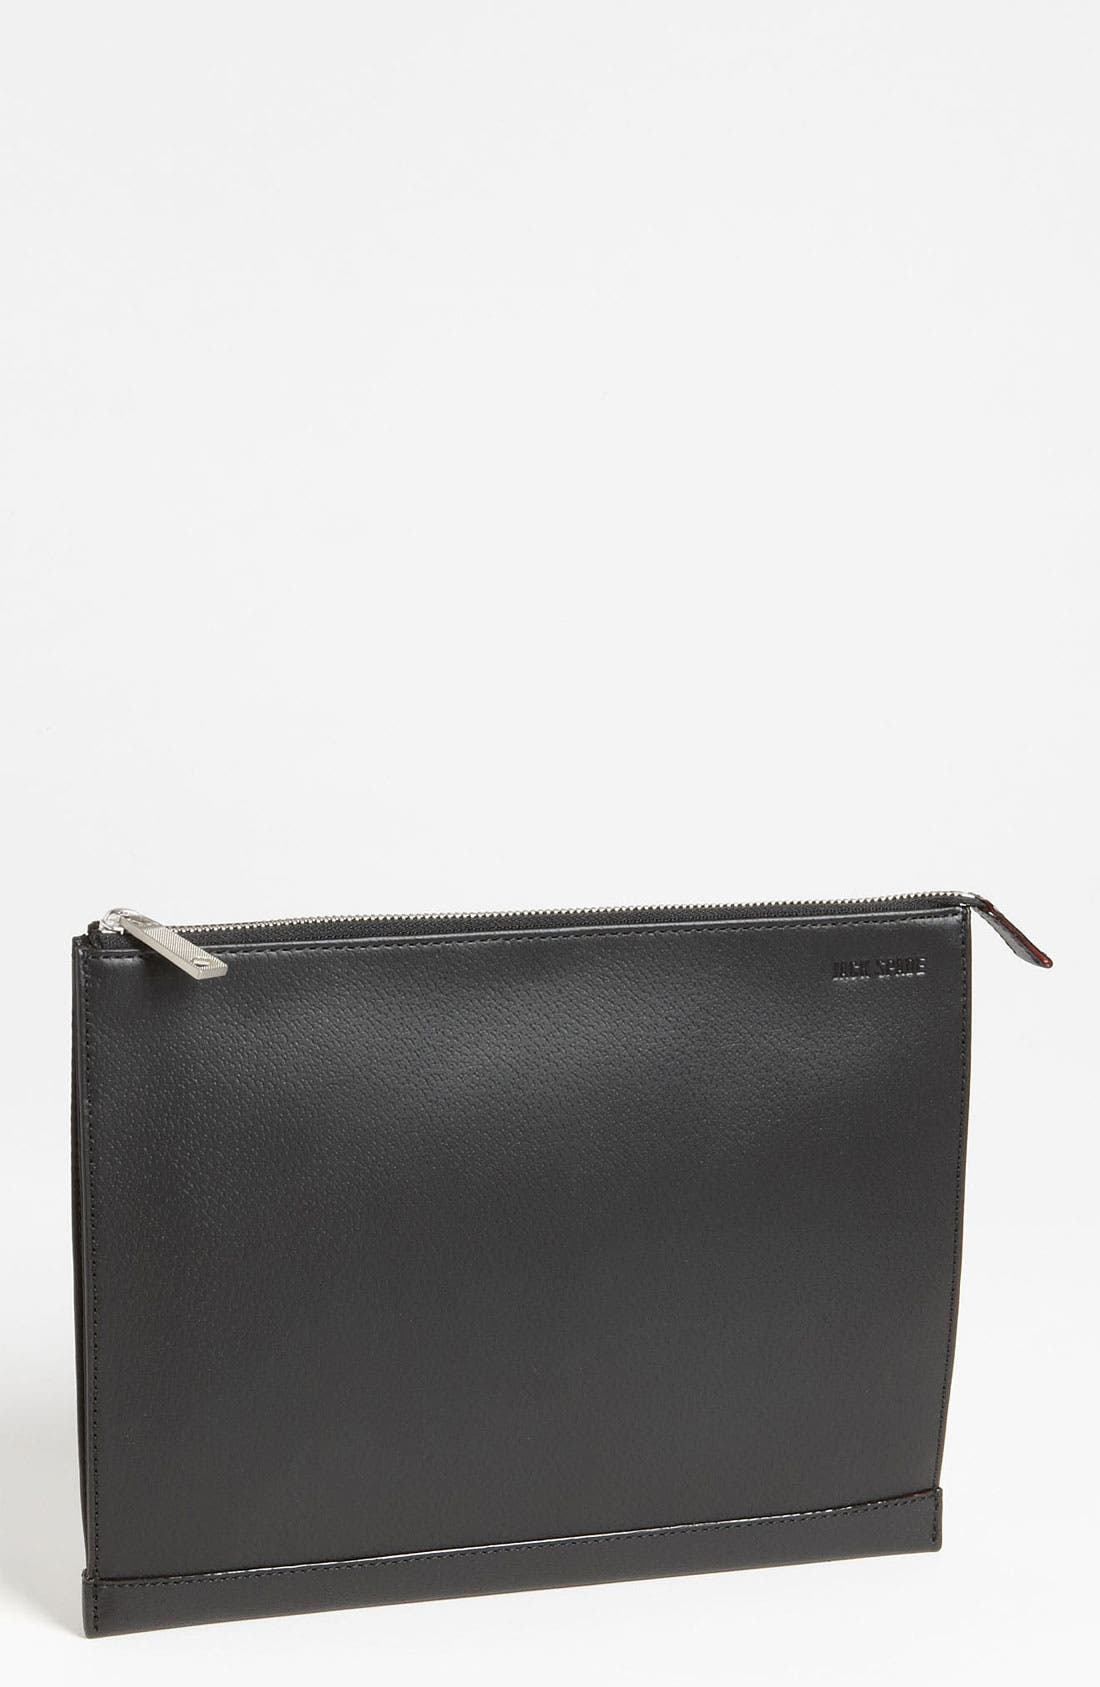 Alternate Image 1 Selected - Jack Spade 'Banker's Envelope - Small' iPad 2 & 3 Case